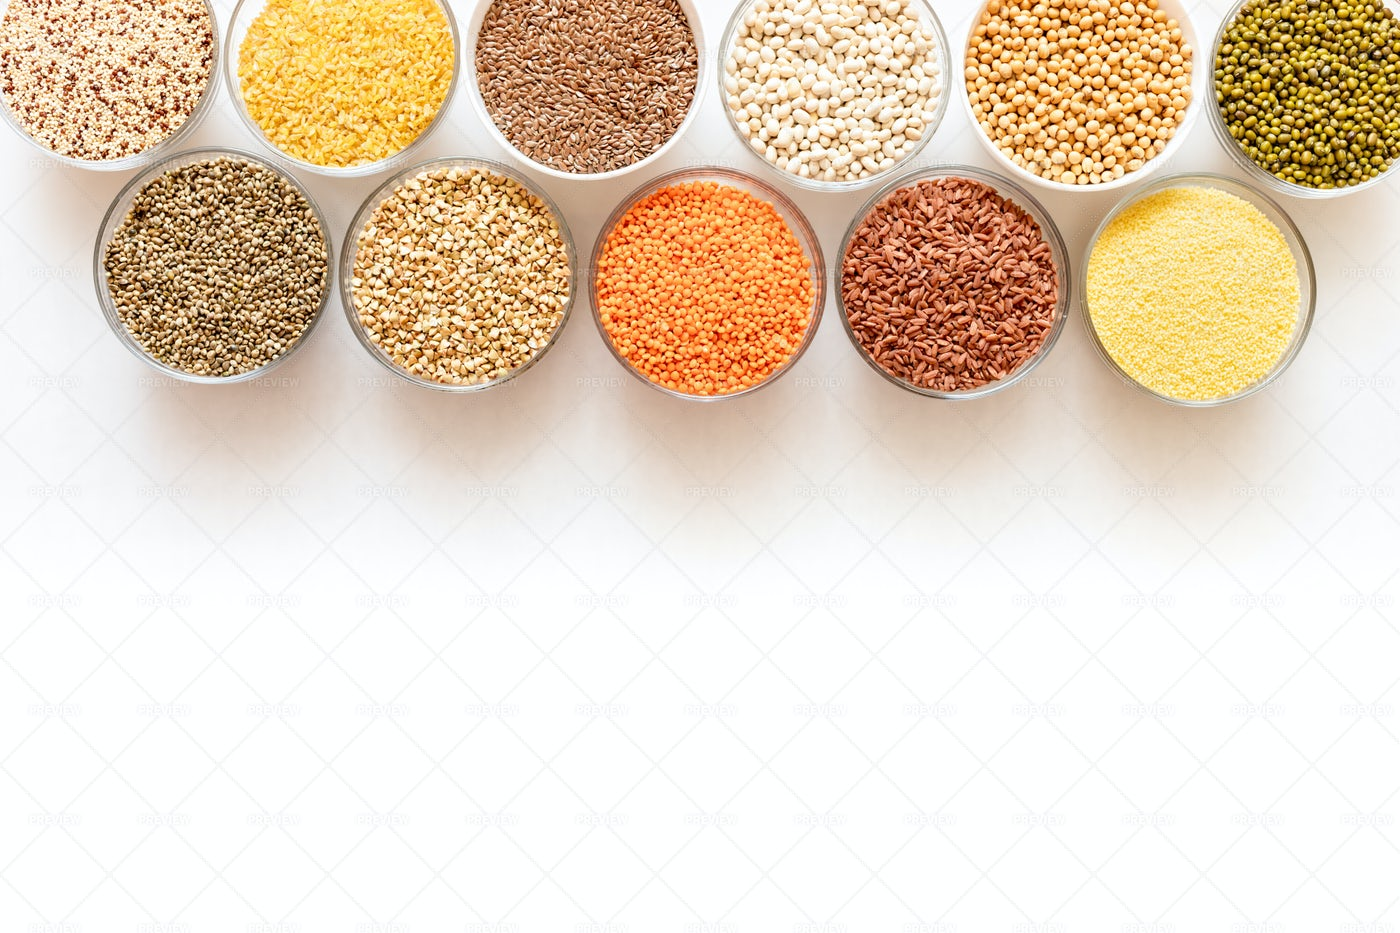 Cereals On White: Stock Photos